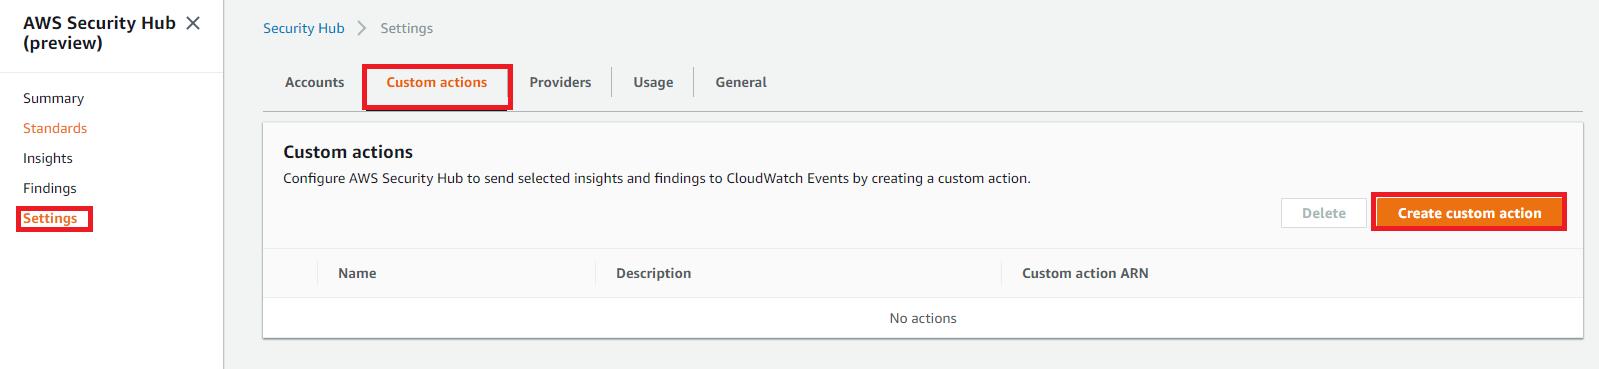 AWS Security Hubのカスタムアクションではリアルタイム通知は